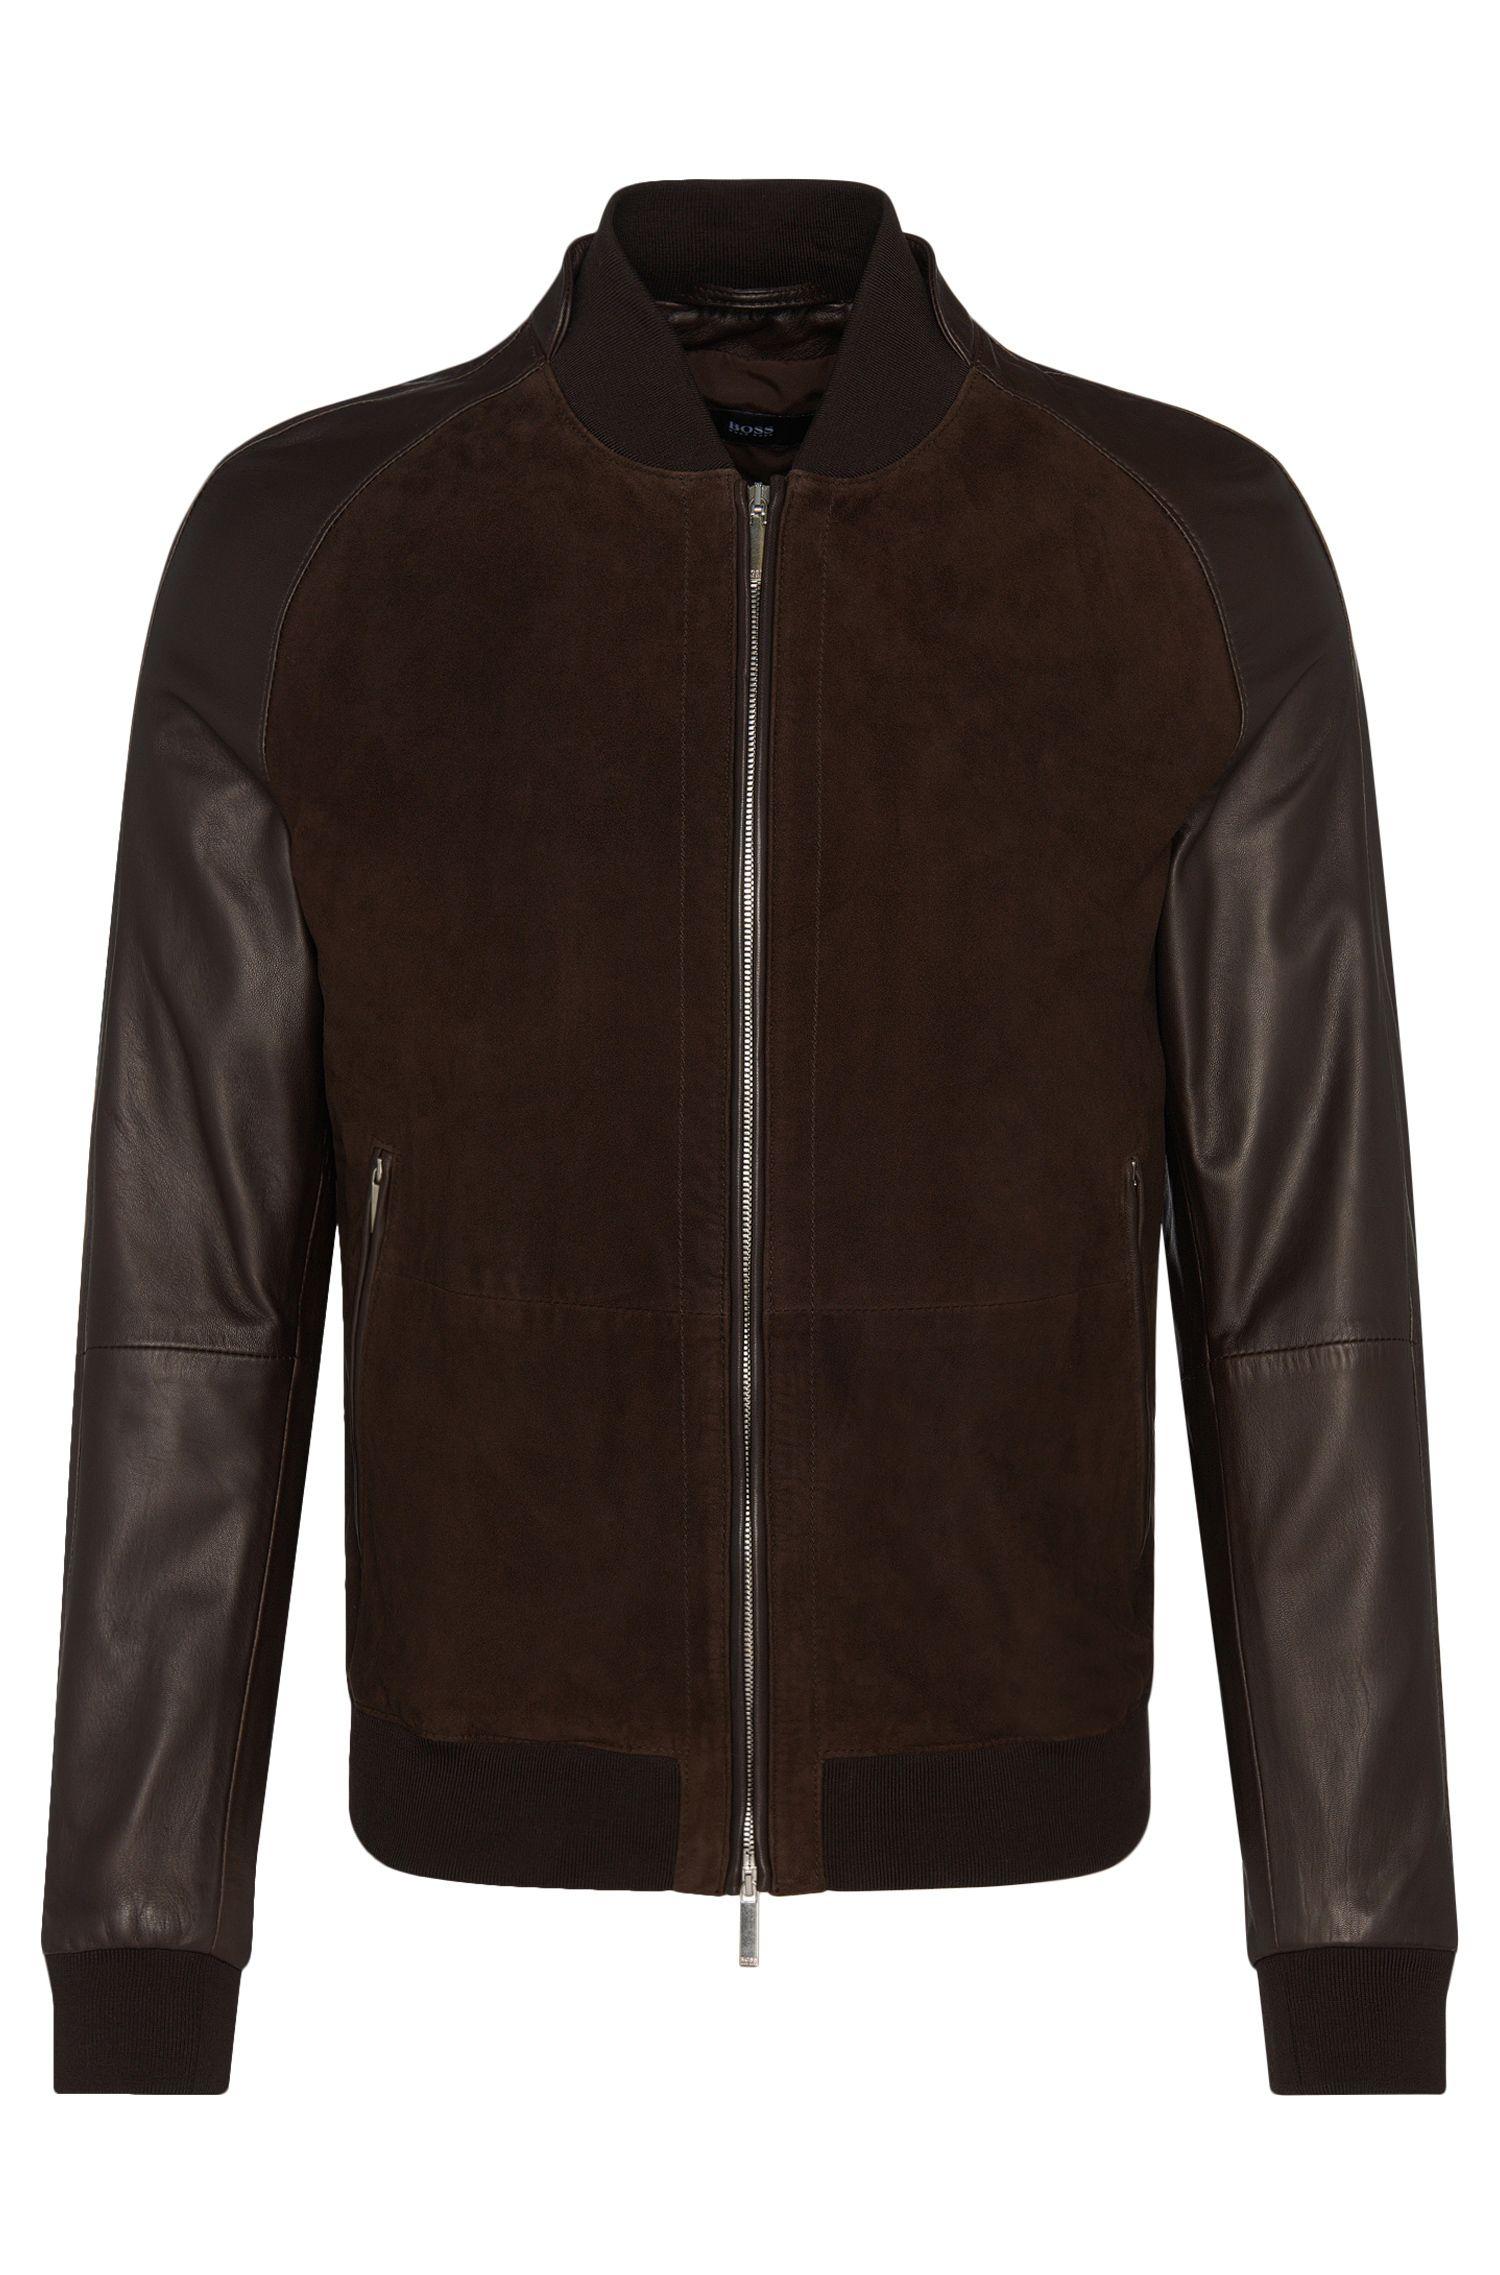 'Mornas' | Sheepskin Plain, Suede Leather Bomber Jacket